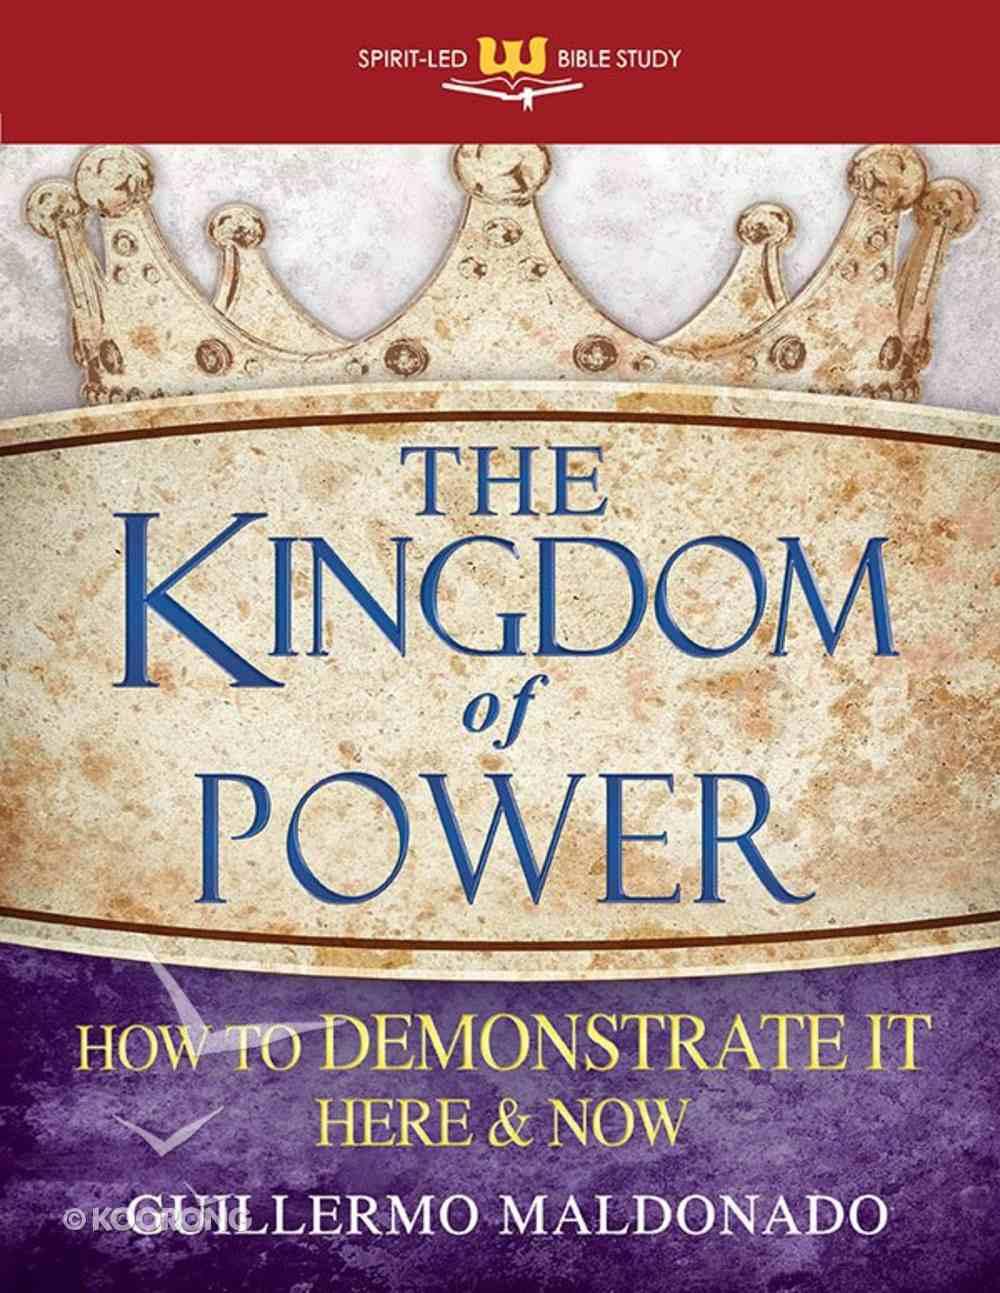 Kingdom of Power (Spirit-led Bible Study) Paperback